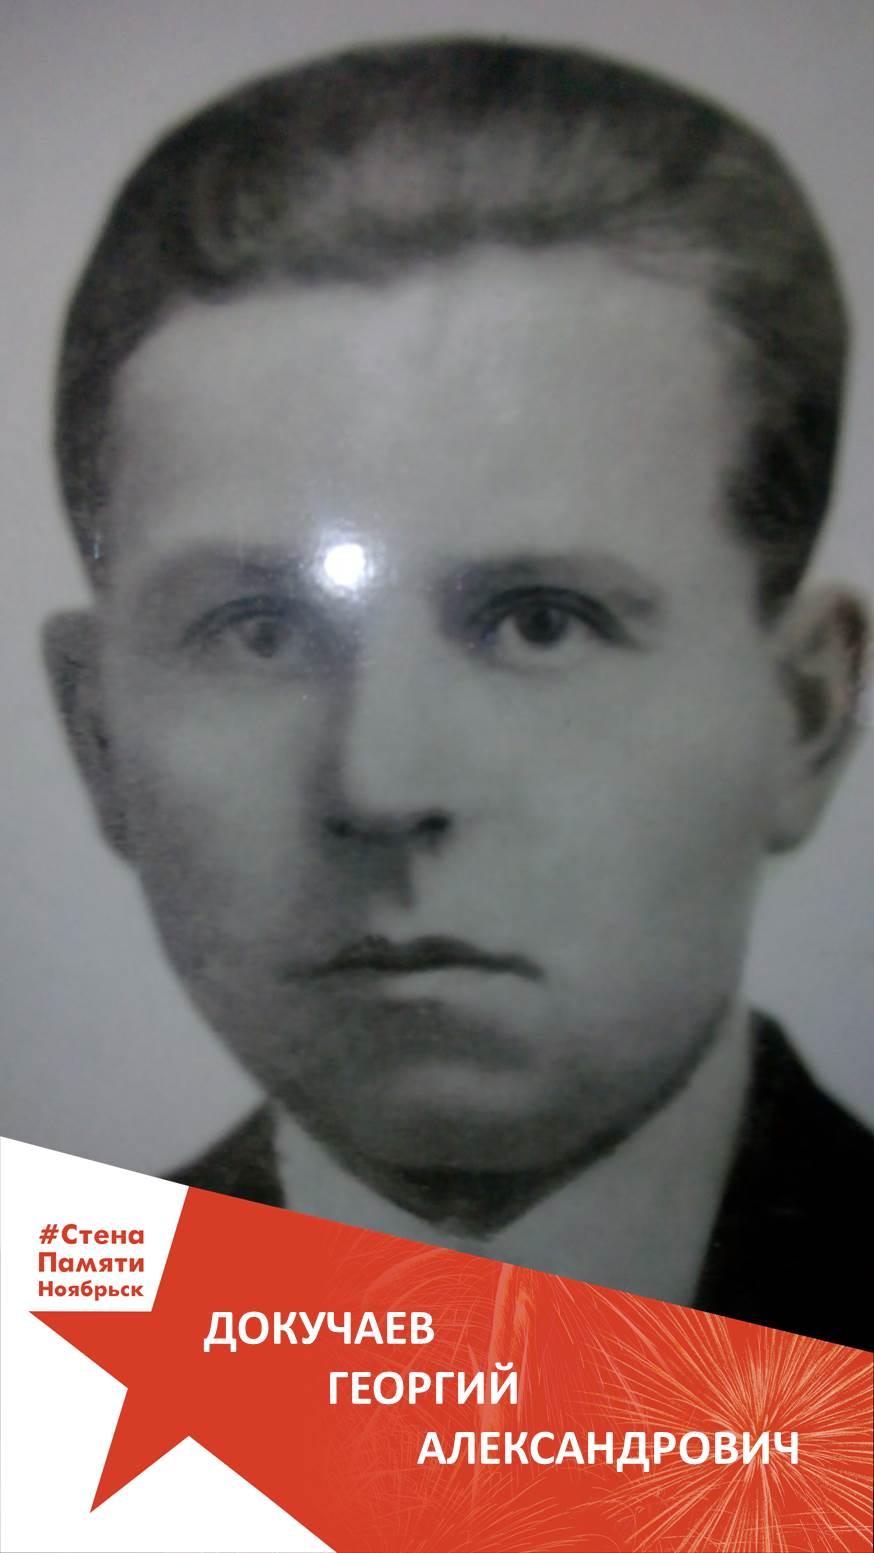 Докучаев Георгий Александрович